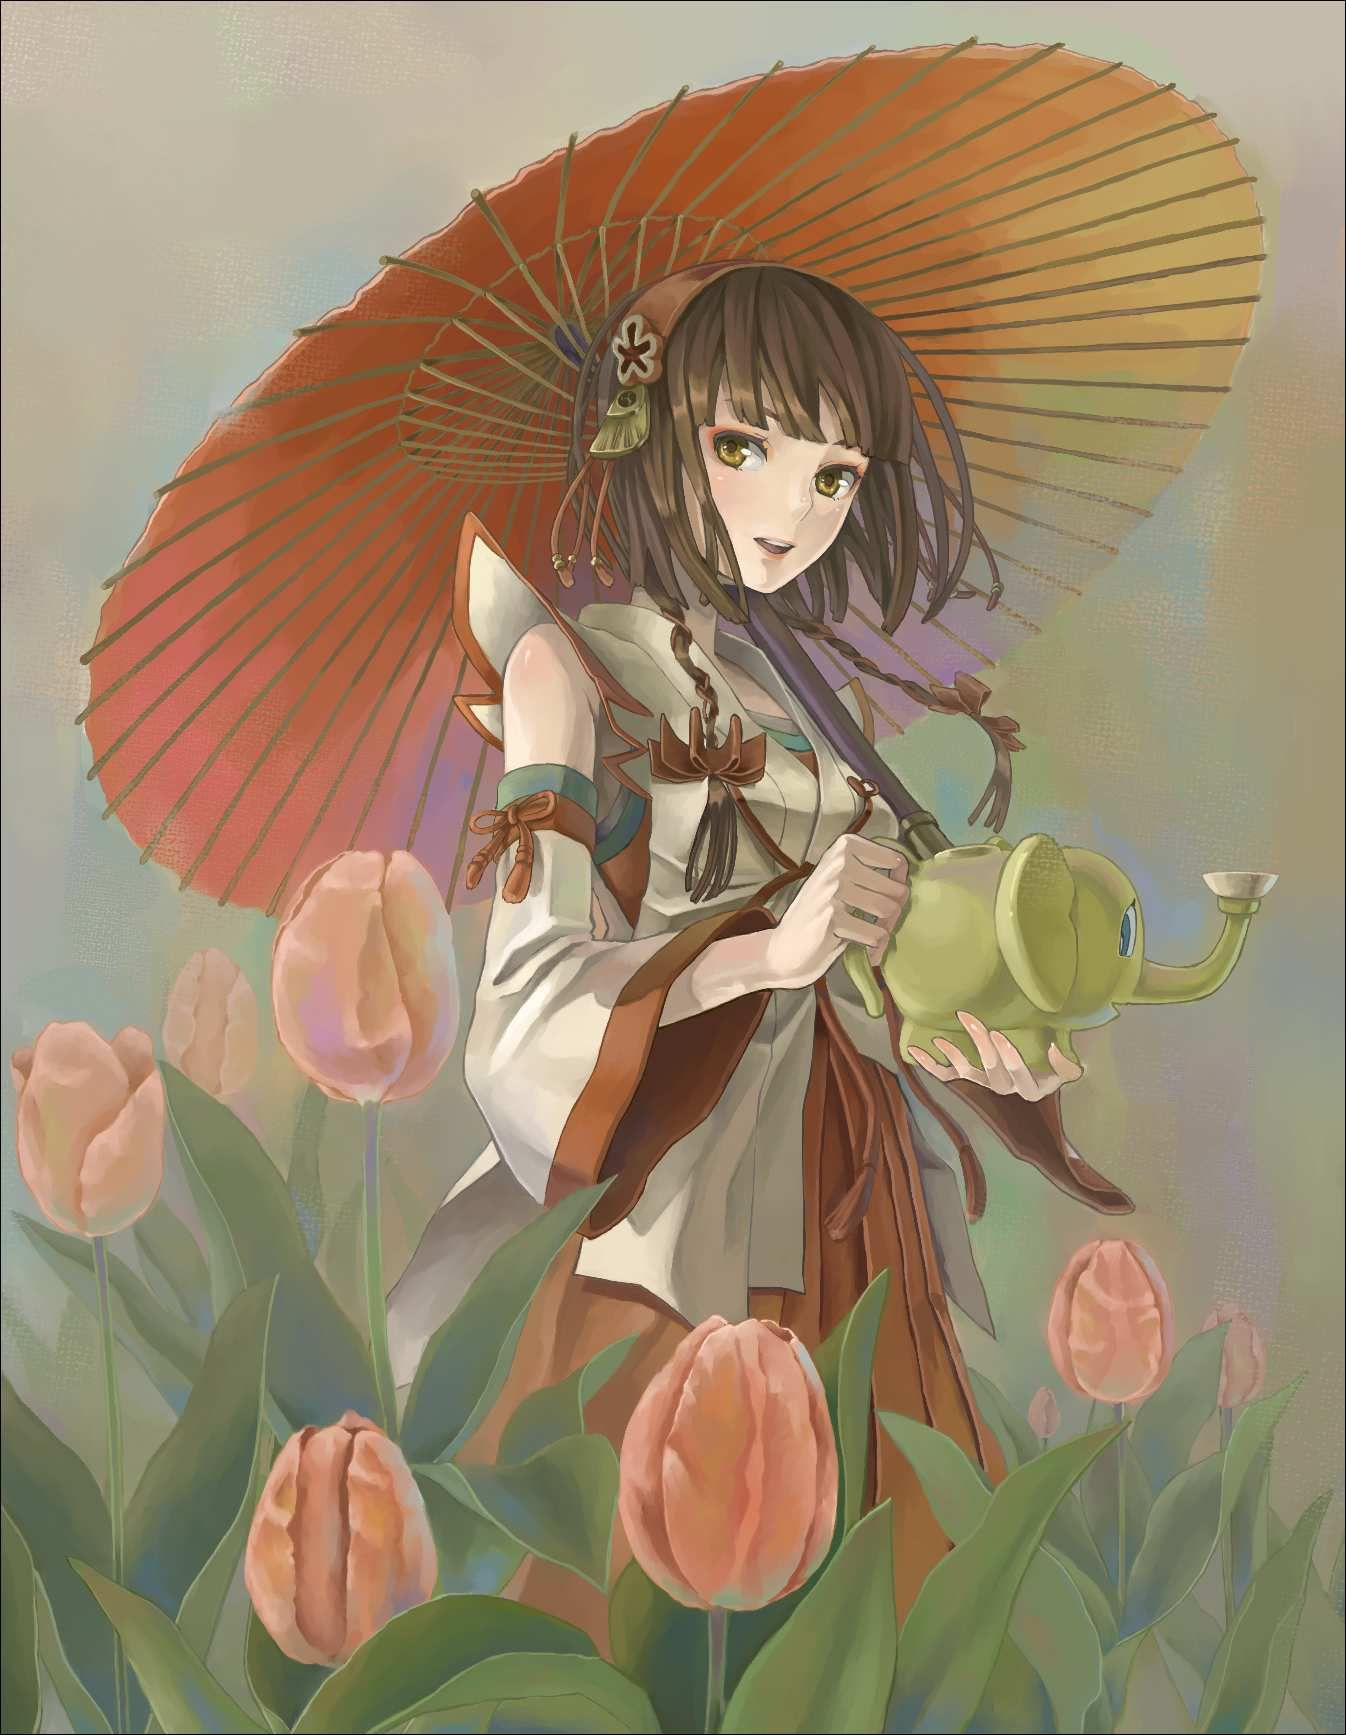 Pin by Anita Supala on My Bookshelf. Samurai warrior